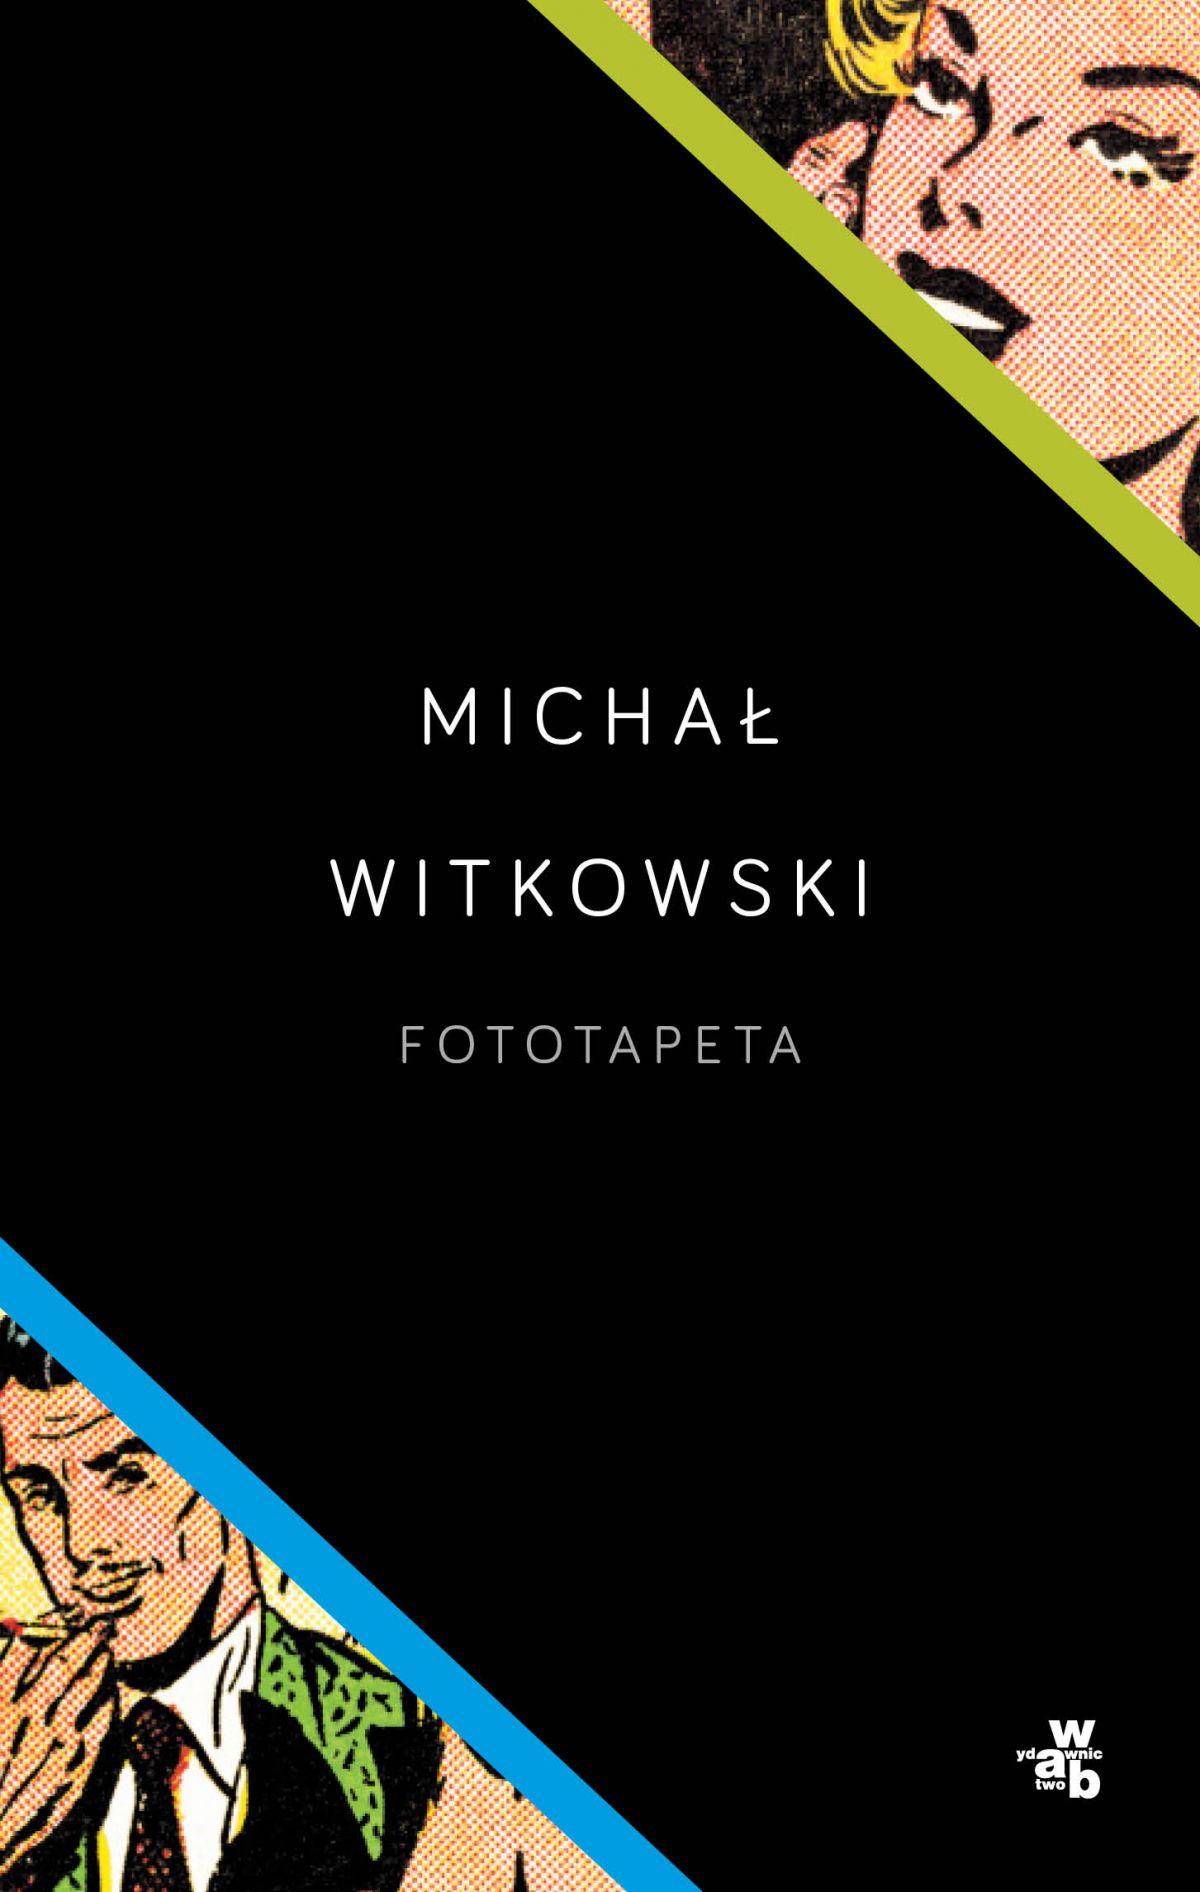 Fototapeta - Ebook (Książka na Kindle) do pobrania w formacie MOBI